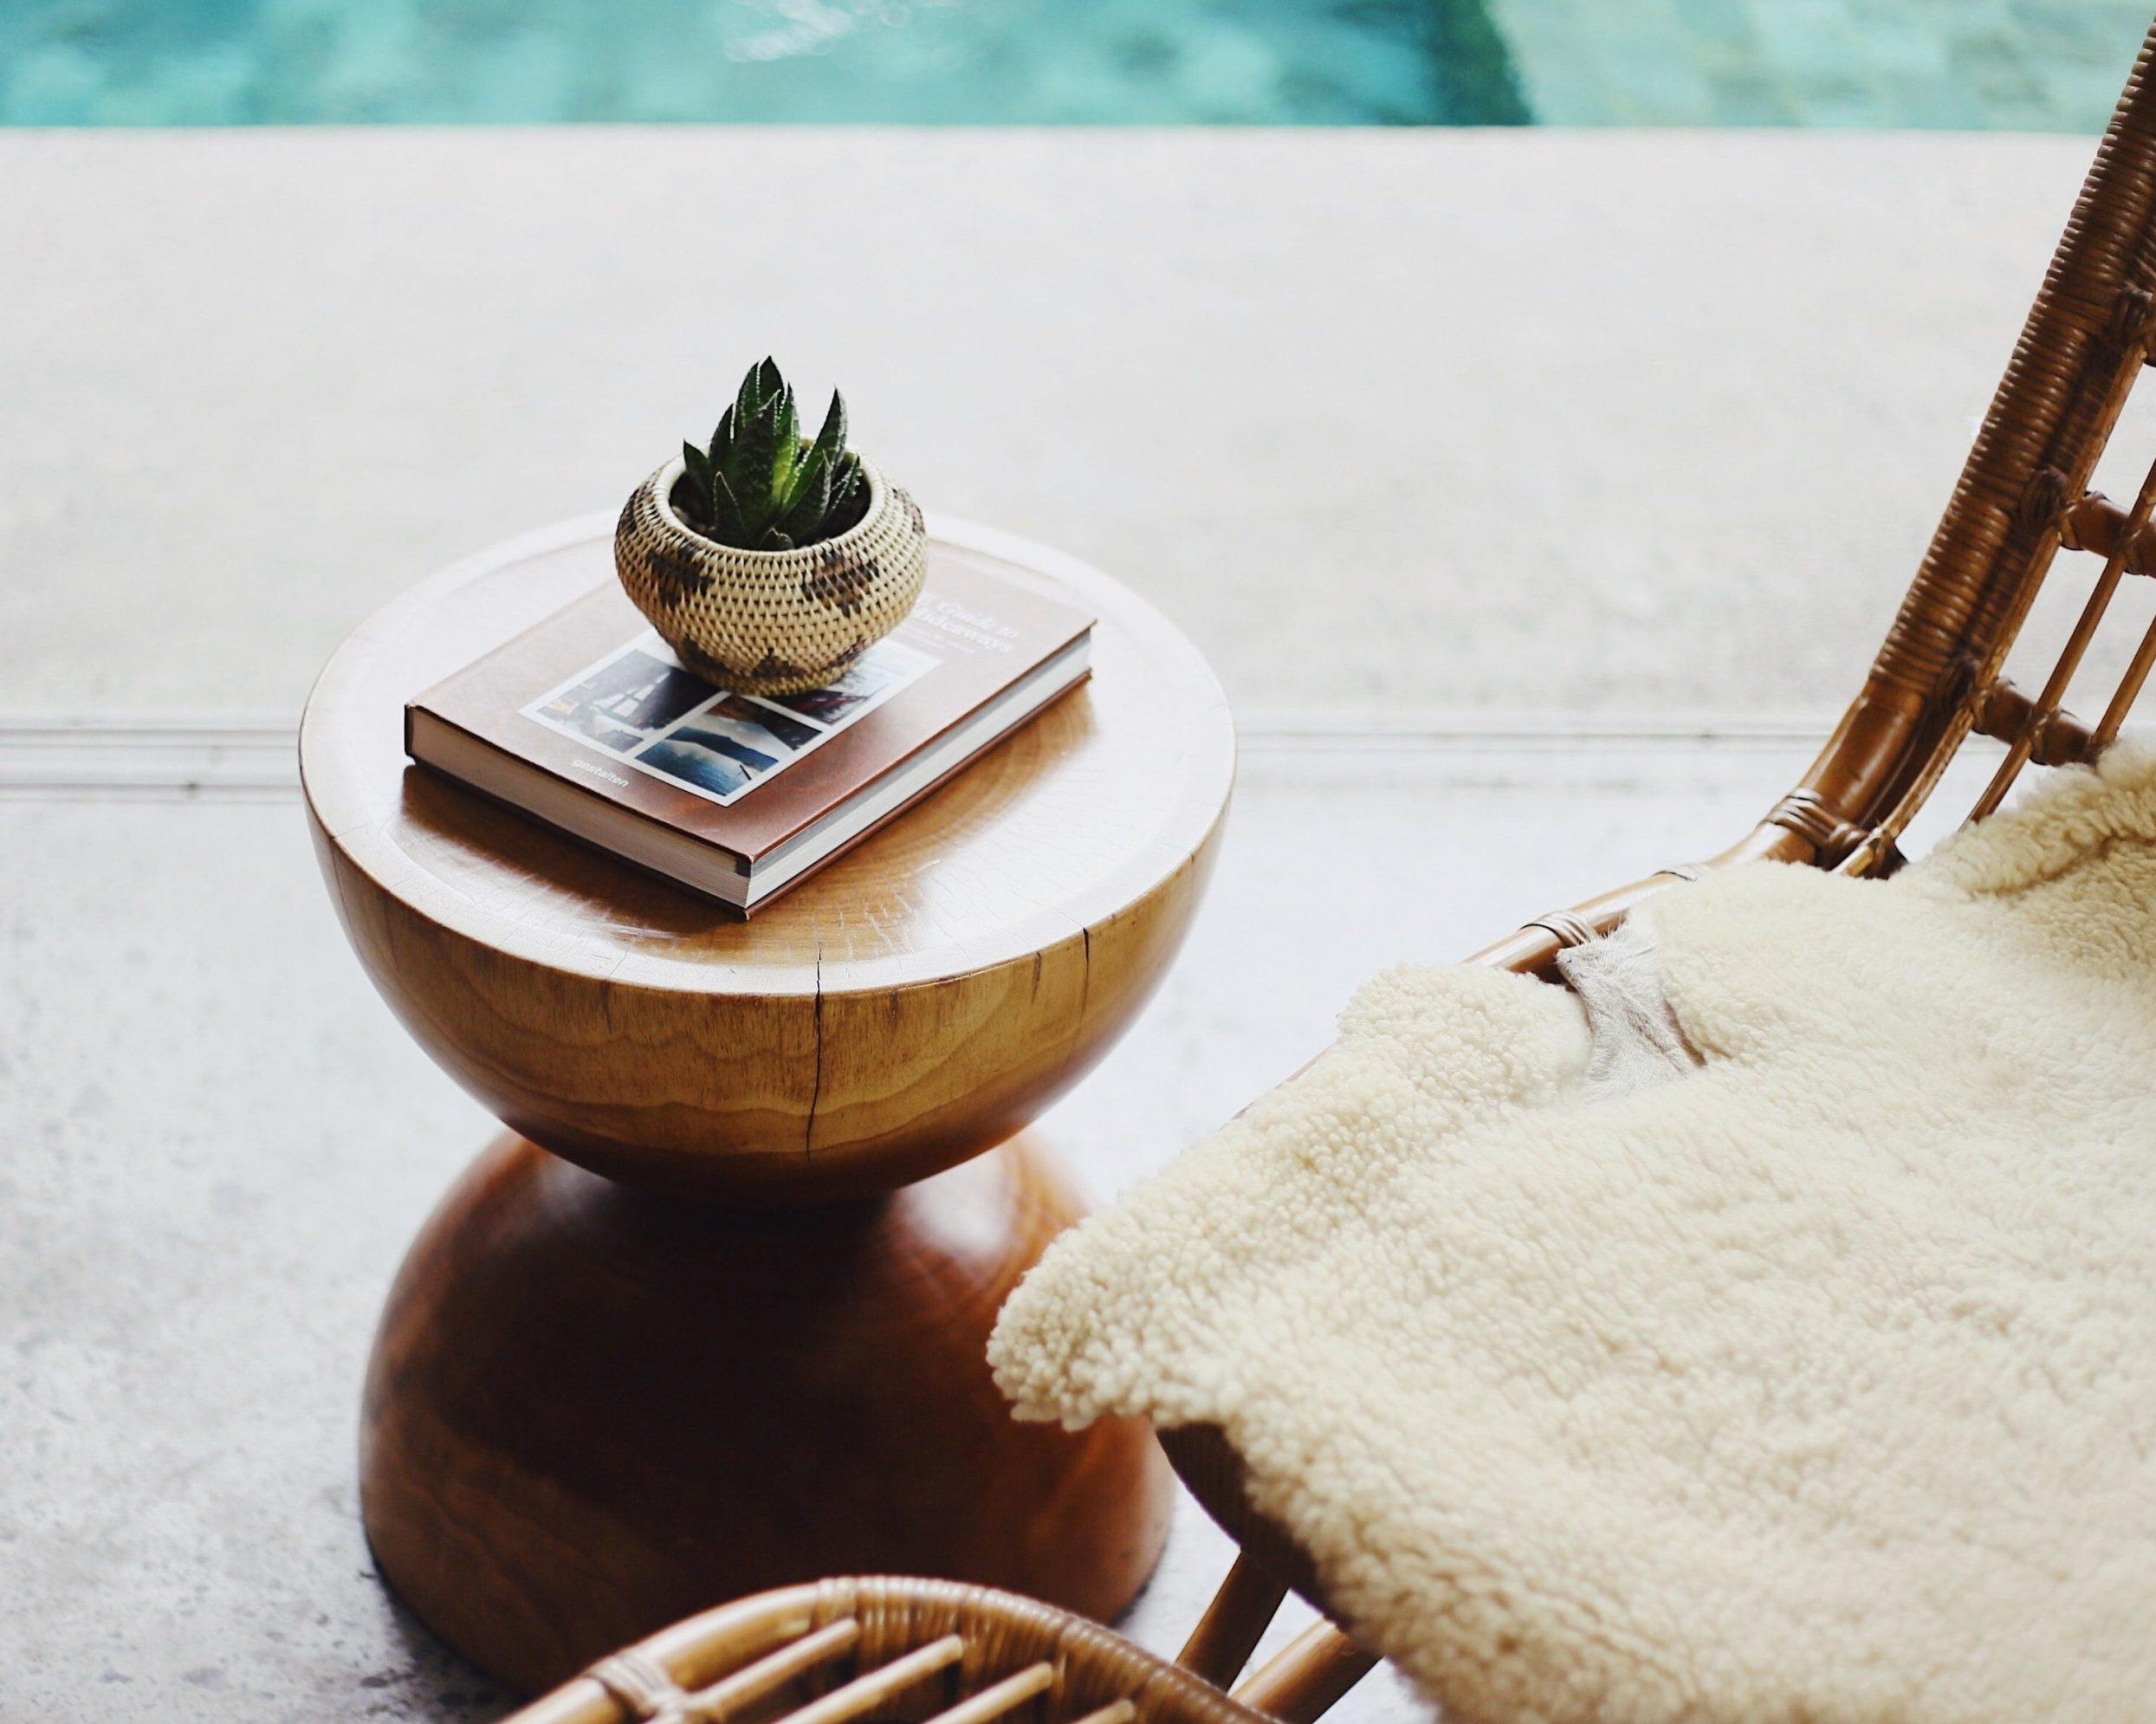 wood-bowl-fake-plant-table